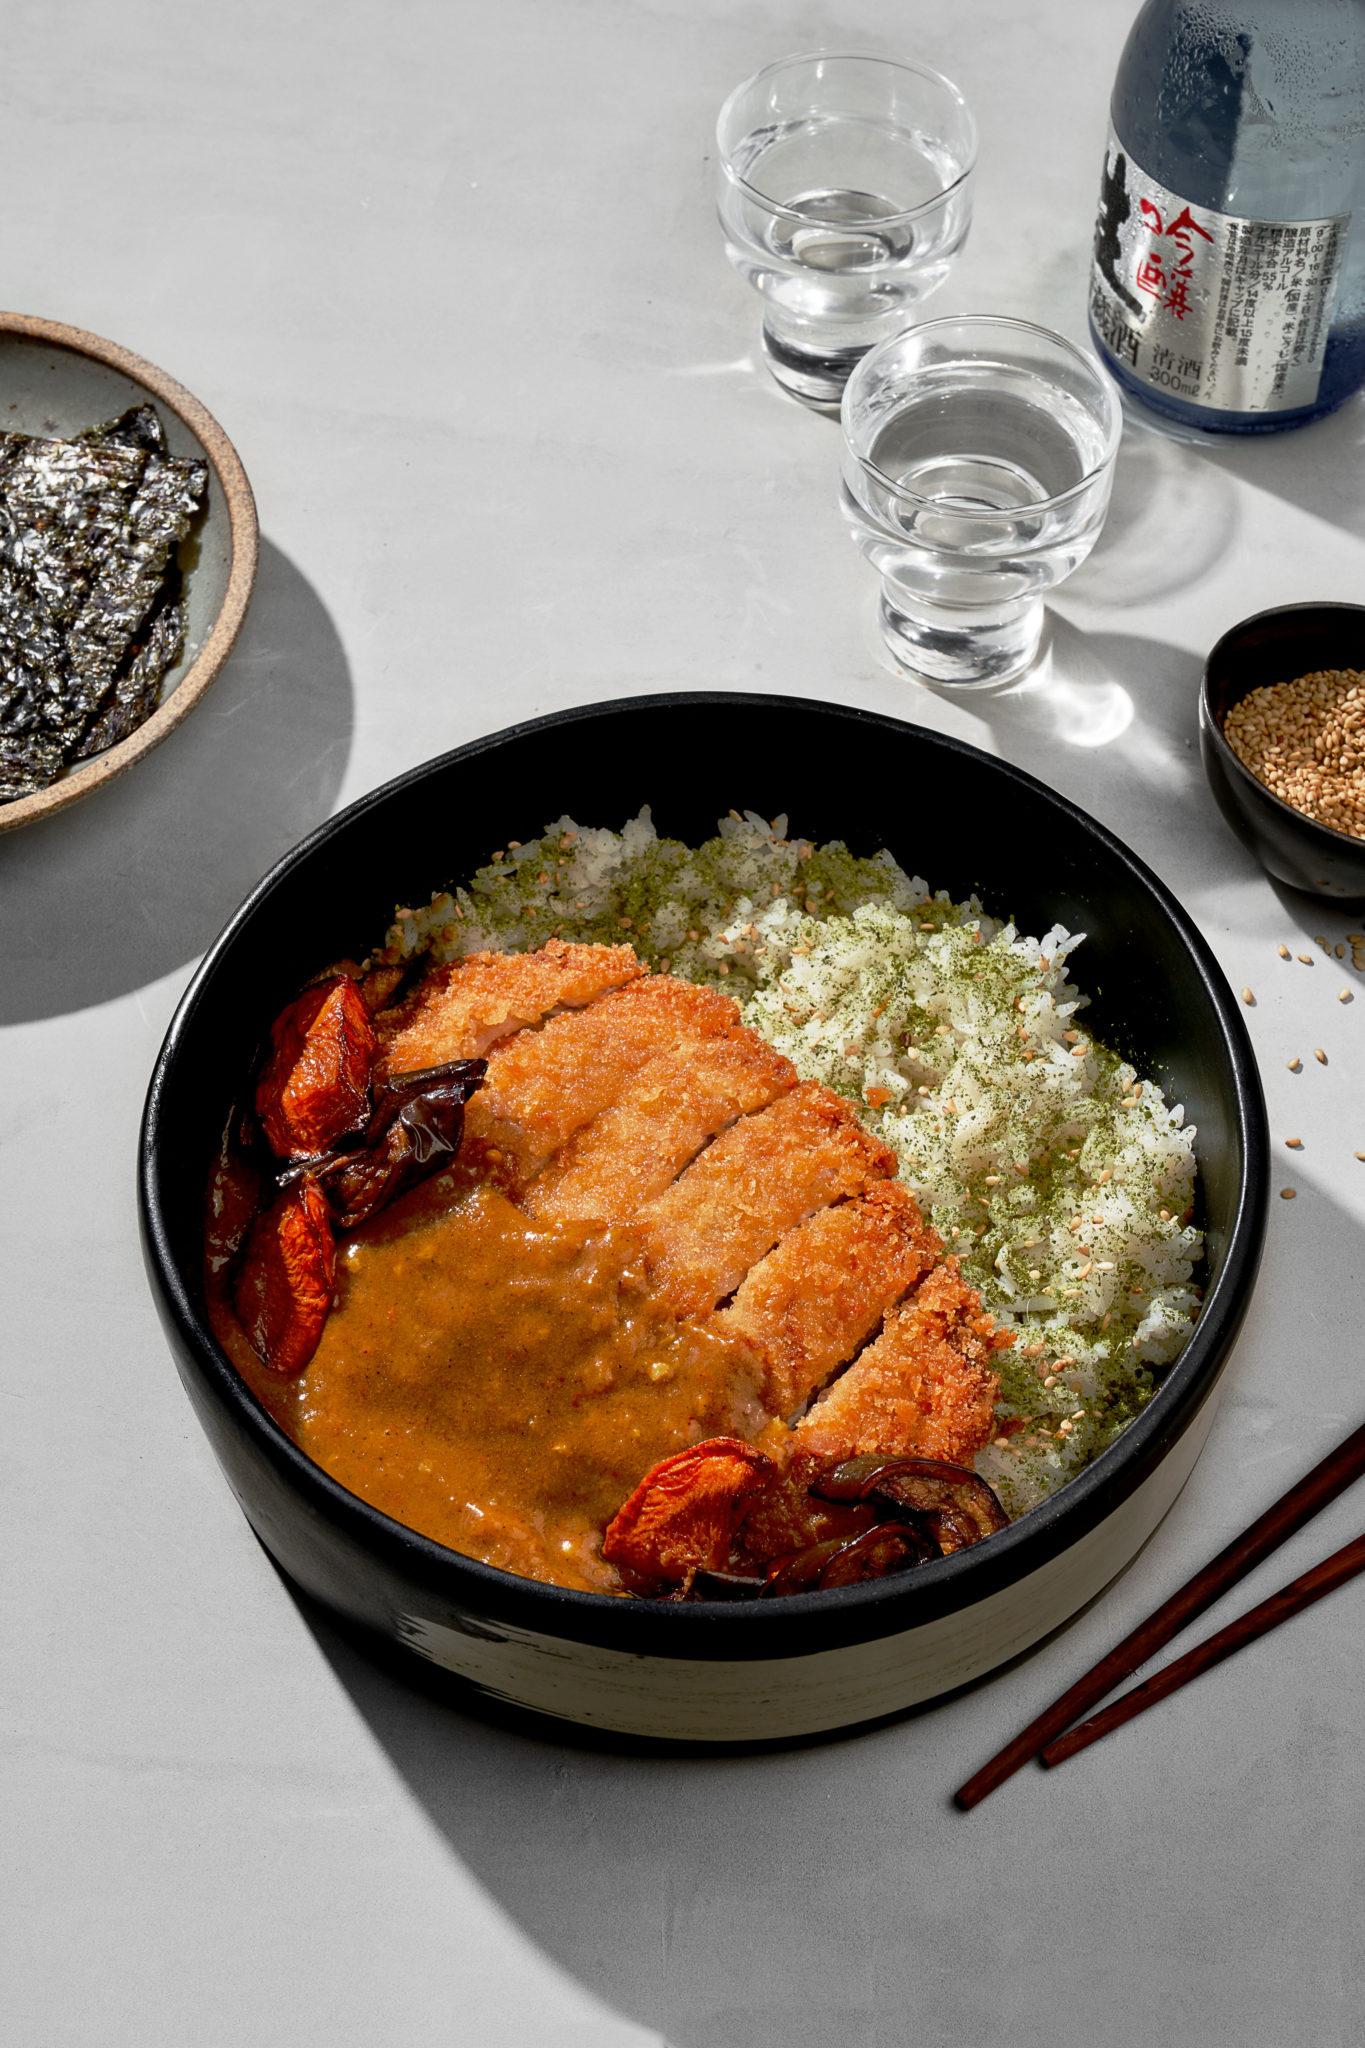 Ooma menu update: Cheese katsu curry don